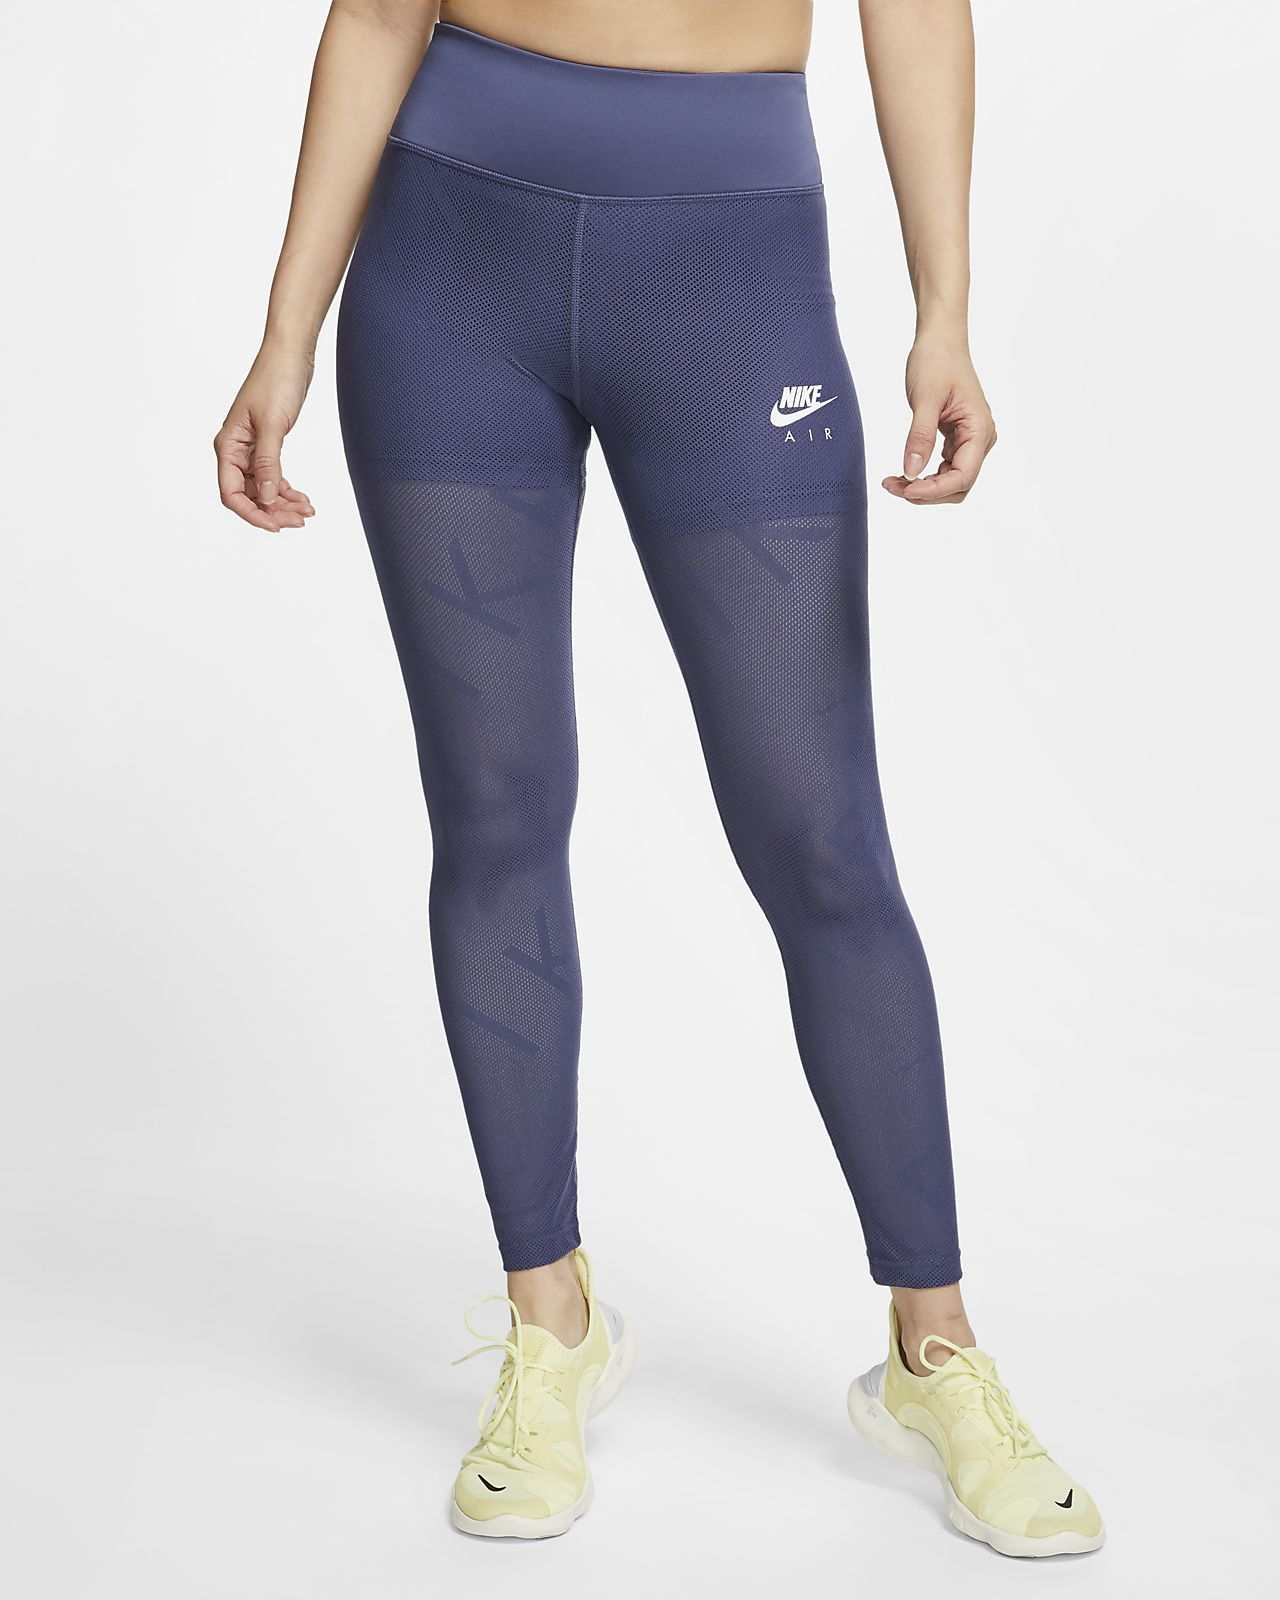 amazing selection pretty cheap pre order Nike Air Women's 7/8 Mesh Running Leggings